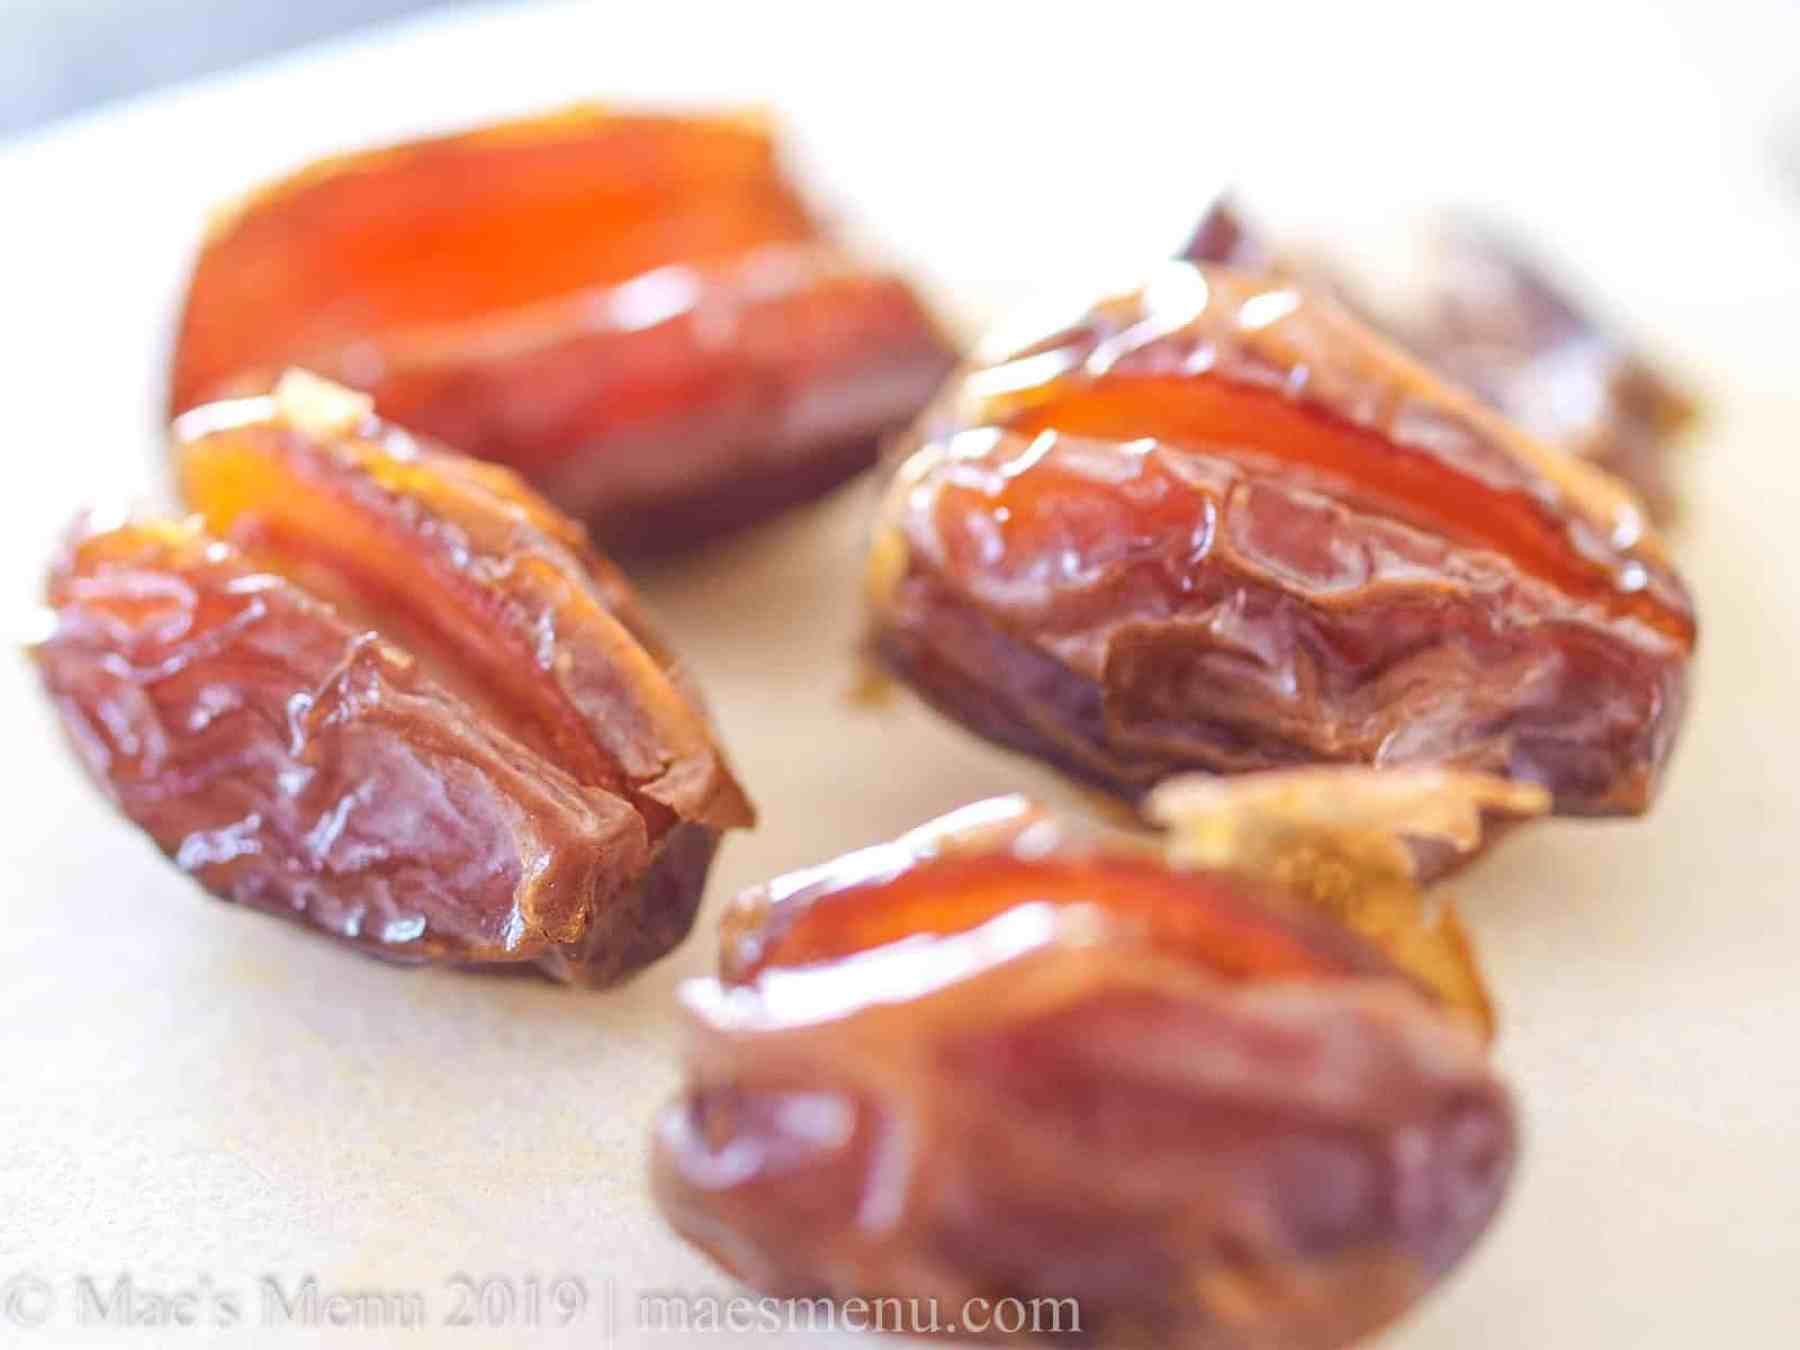 Up-close of medjool dates.